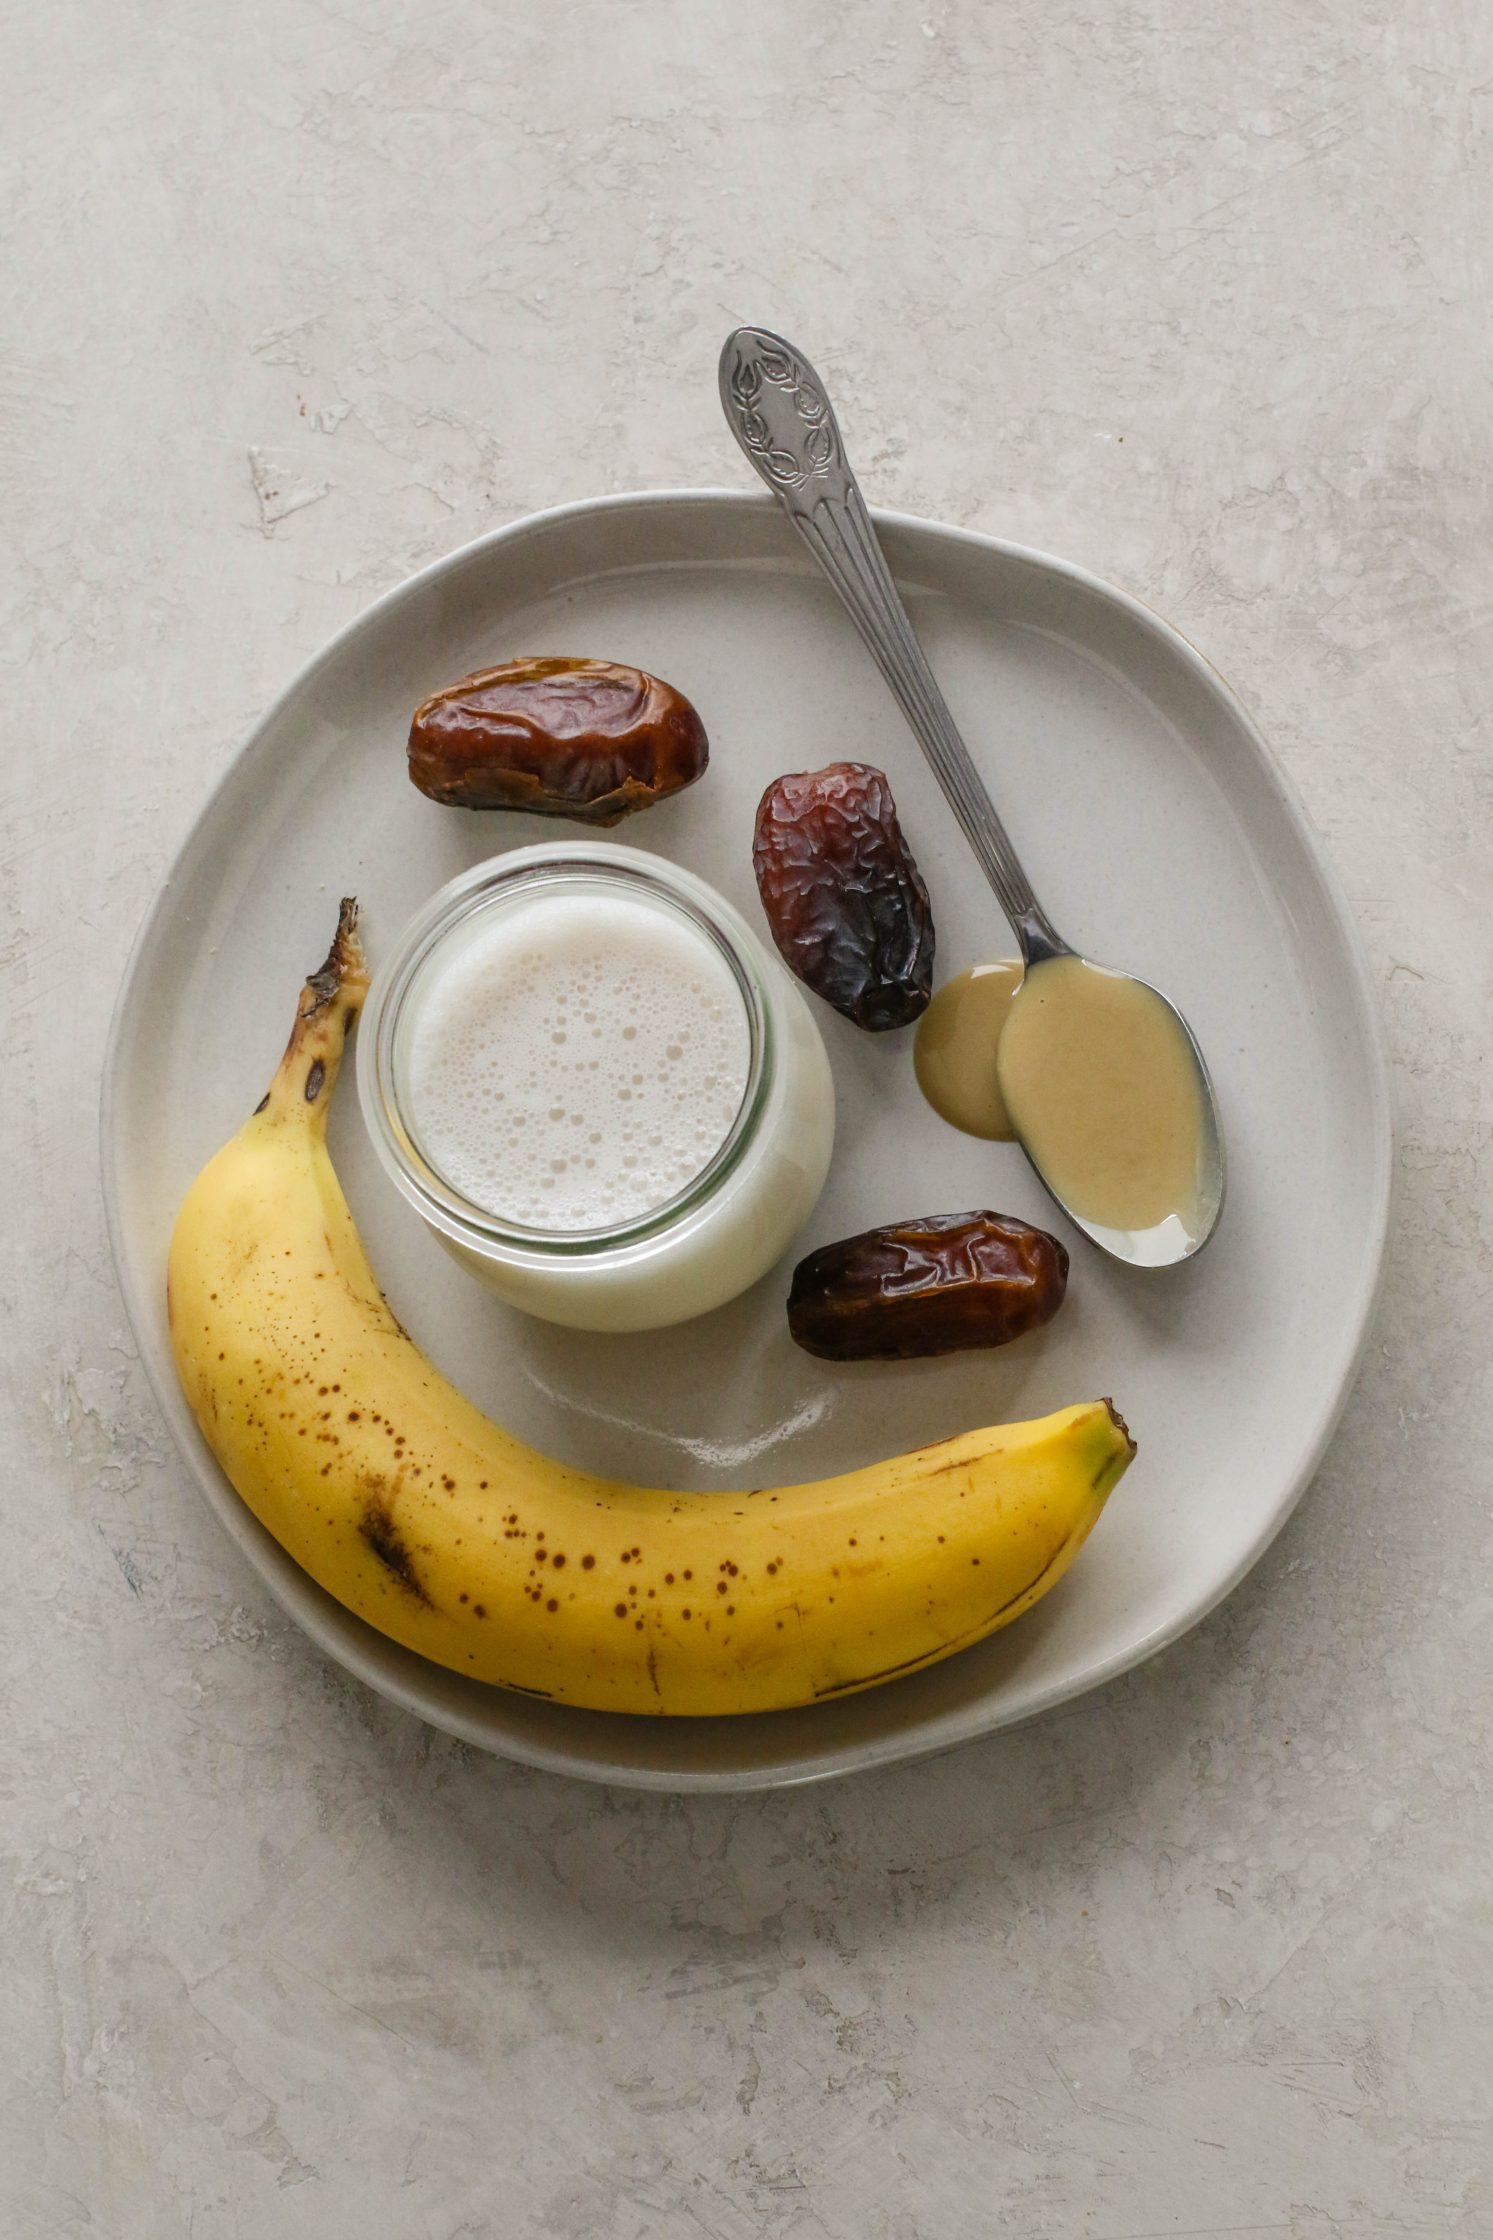 Tahini Date Shake (2-Ways!) Ingredients